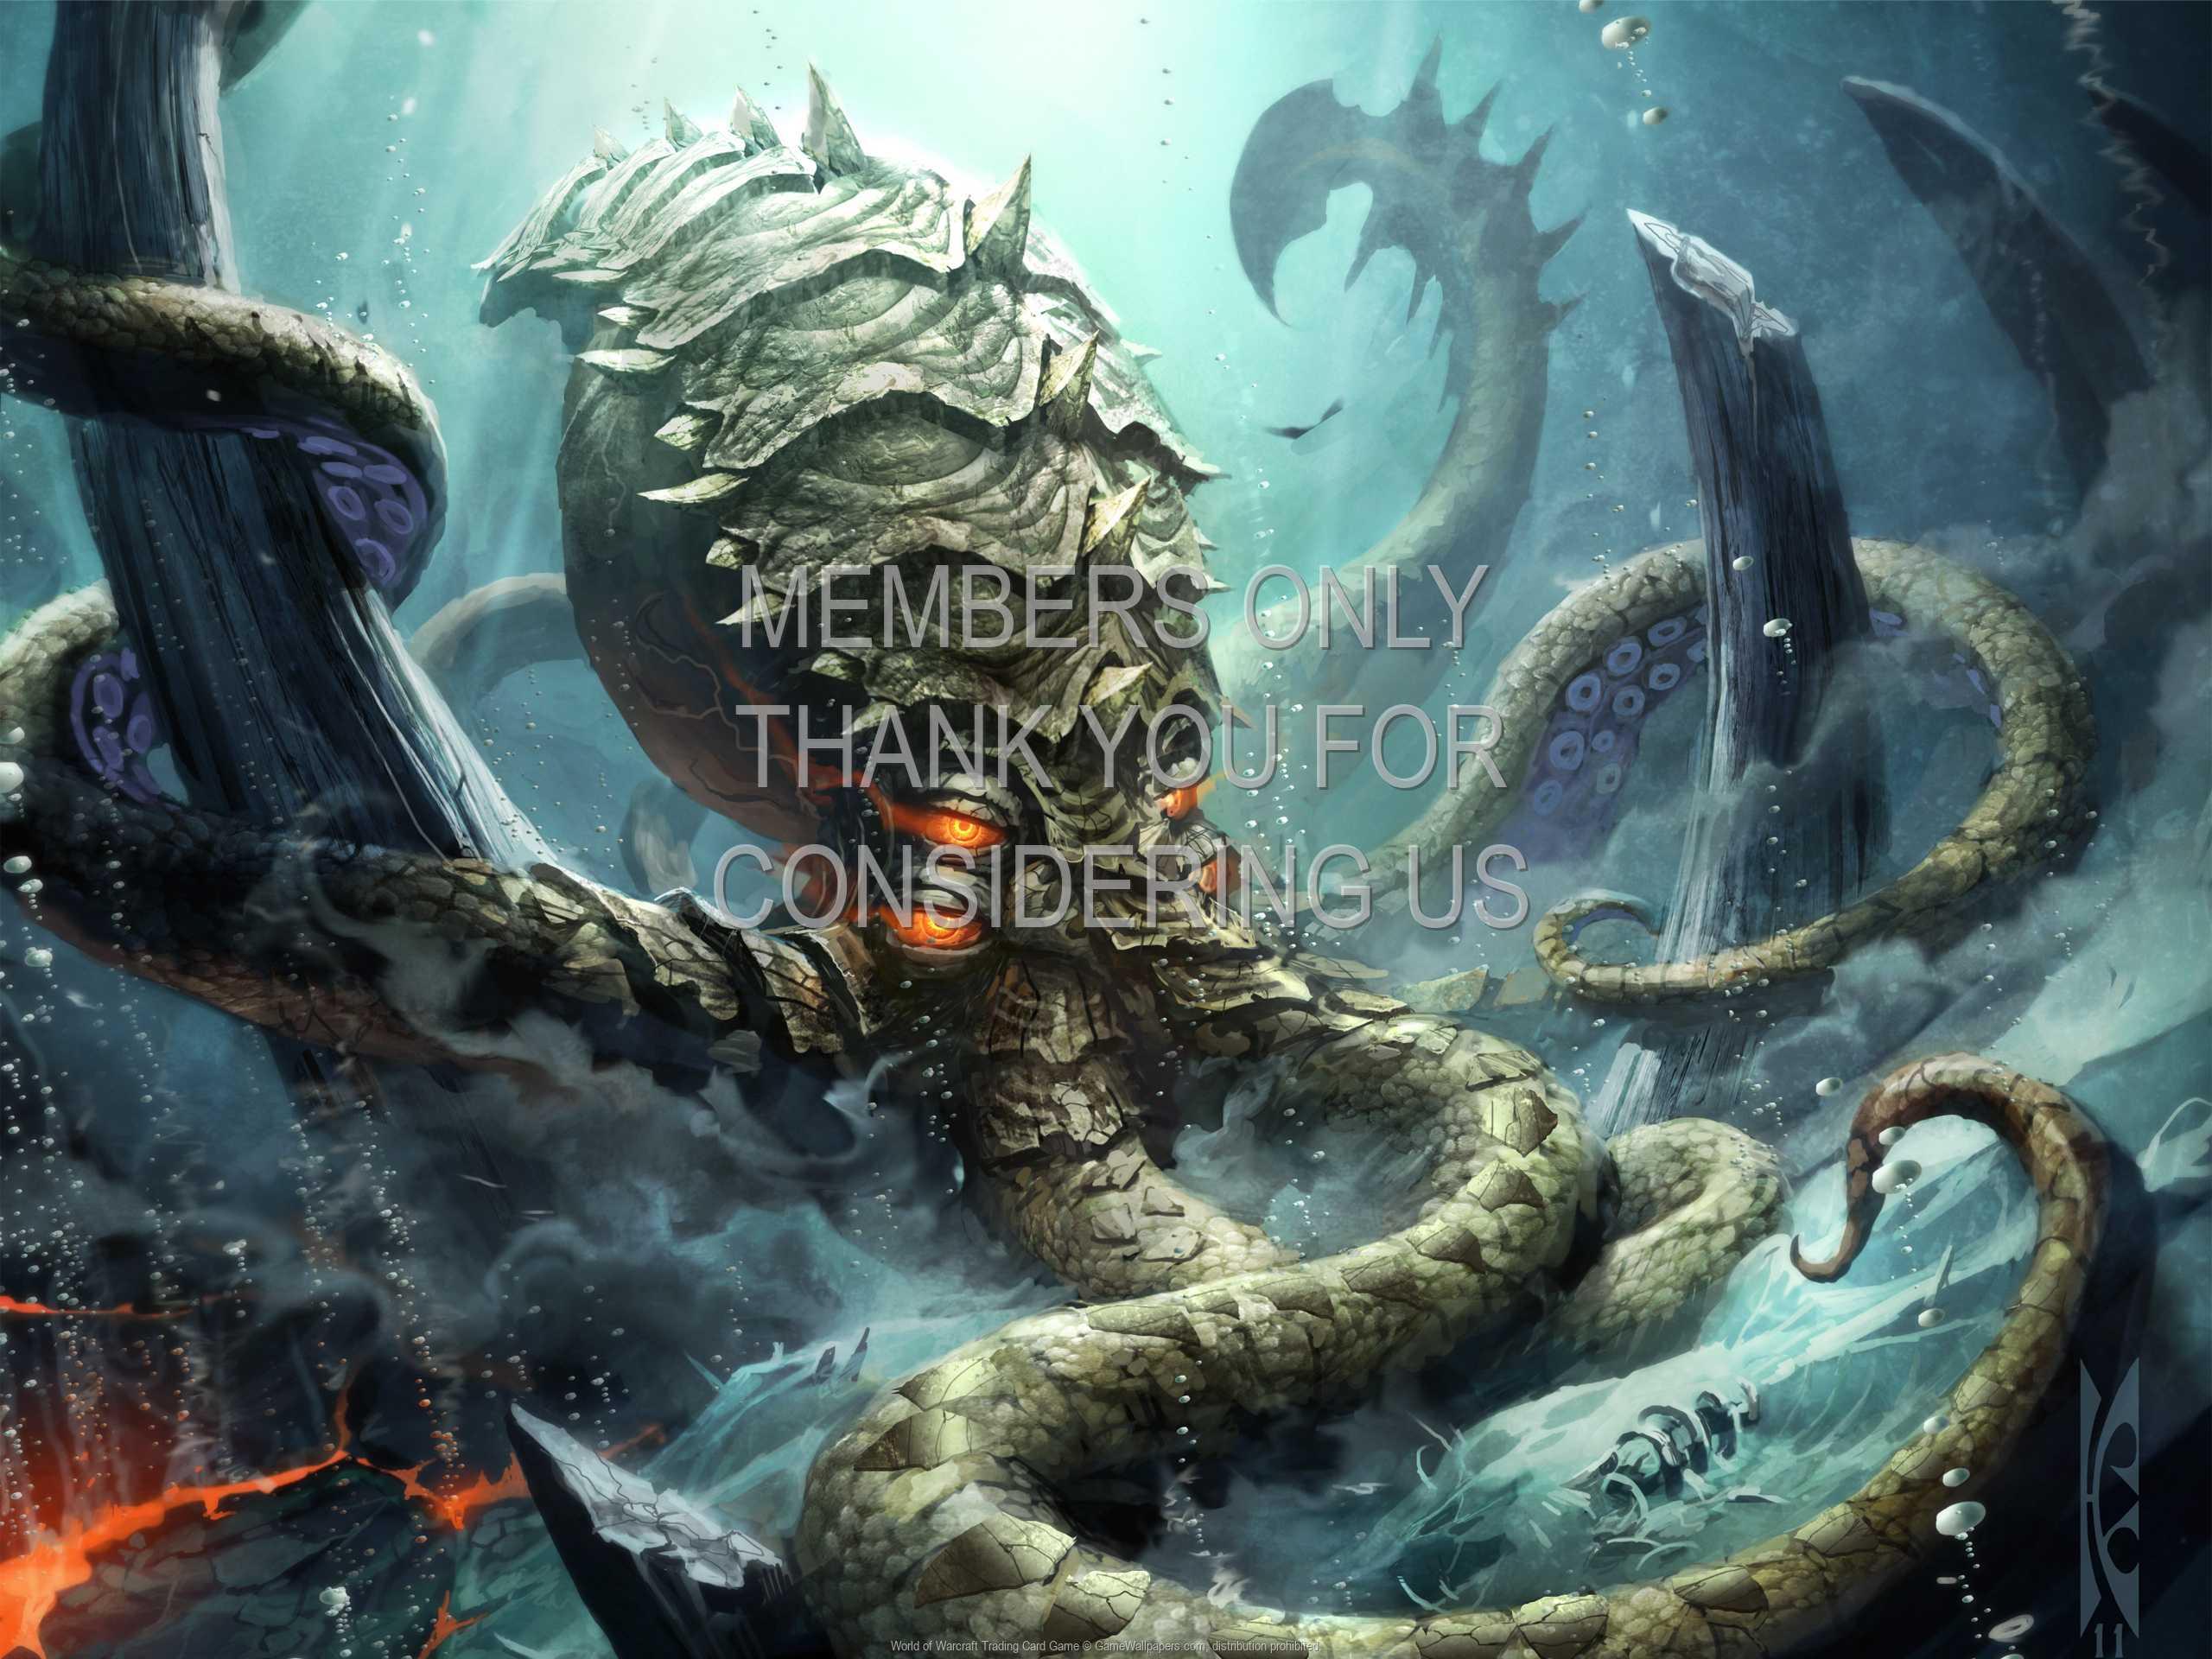 World of Warcraft: Trading Card Game 1080p Horizontal Handy Hintergrundbild 57